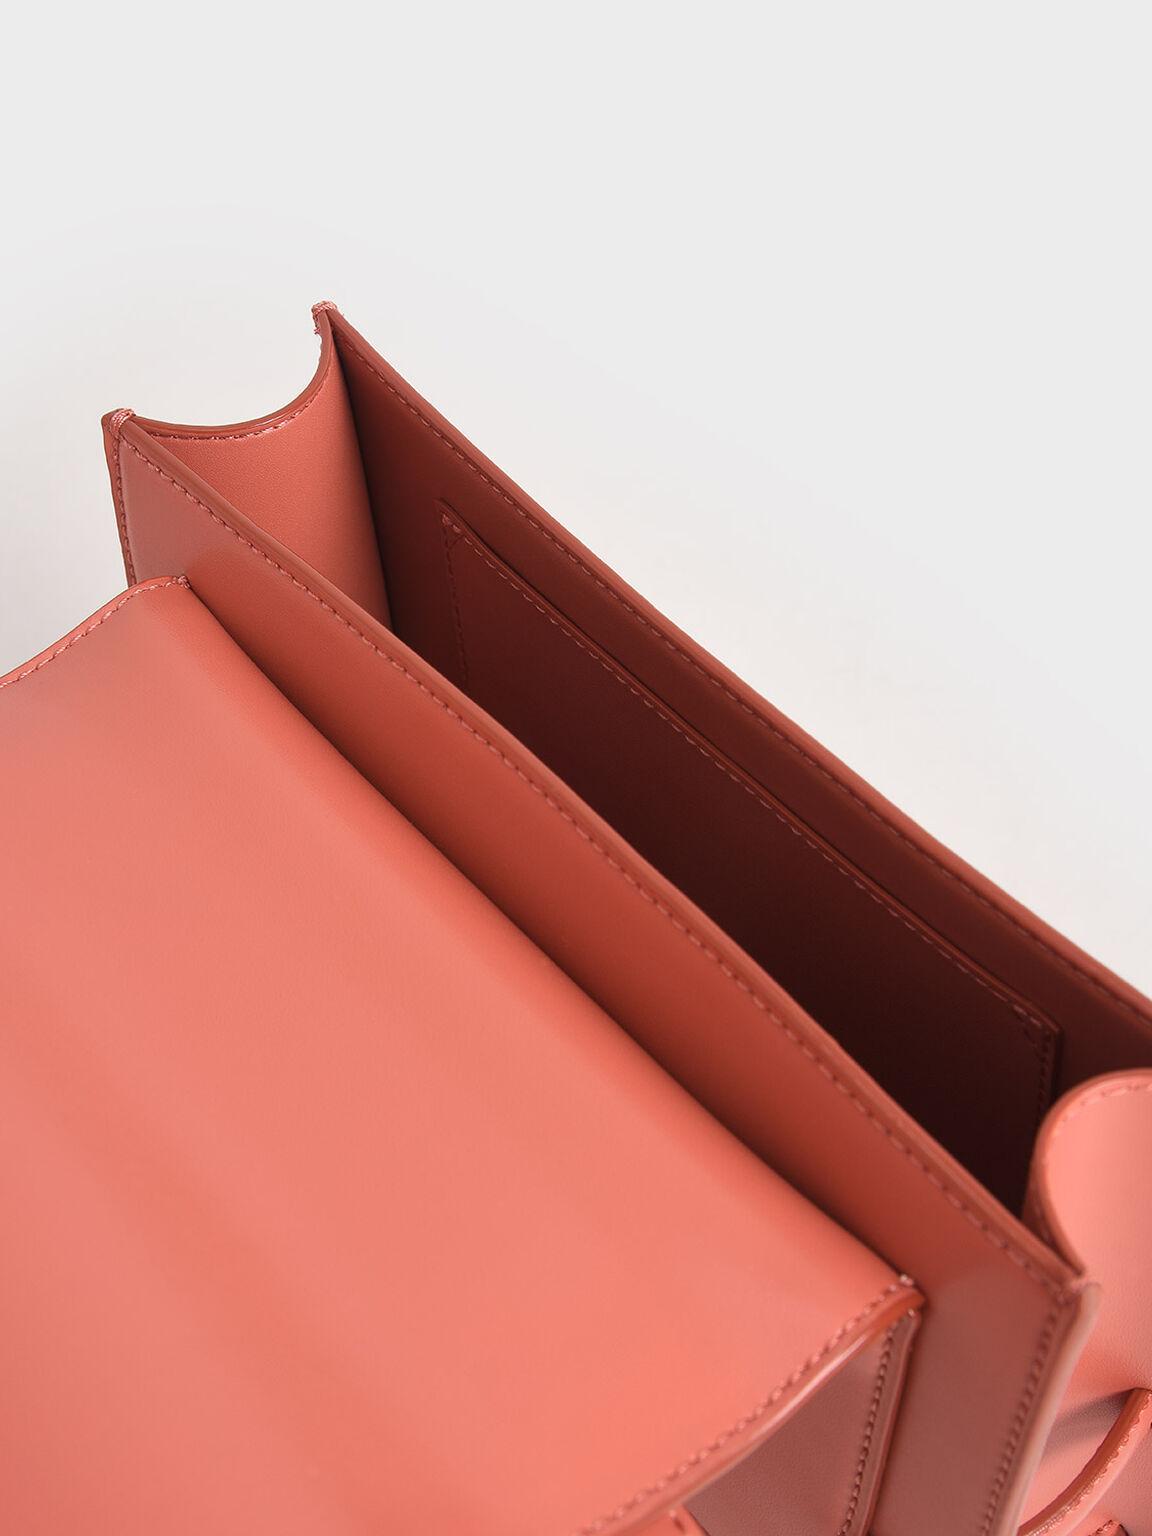 三角立體釦小方包, 珊瑚色, hi-res